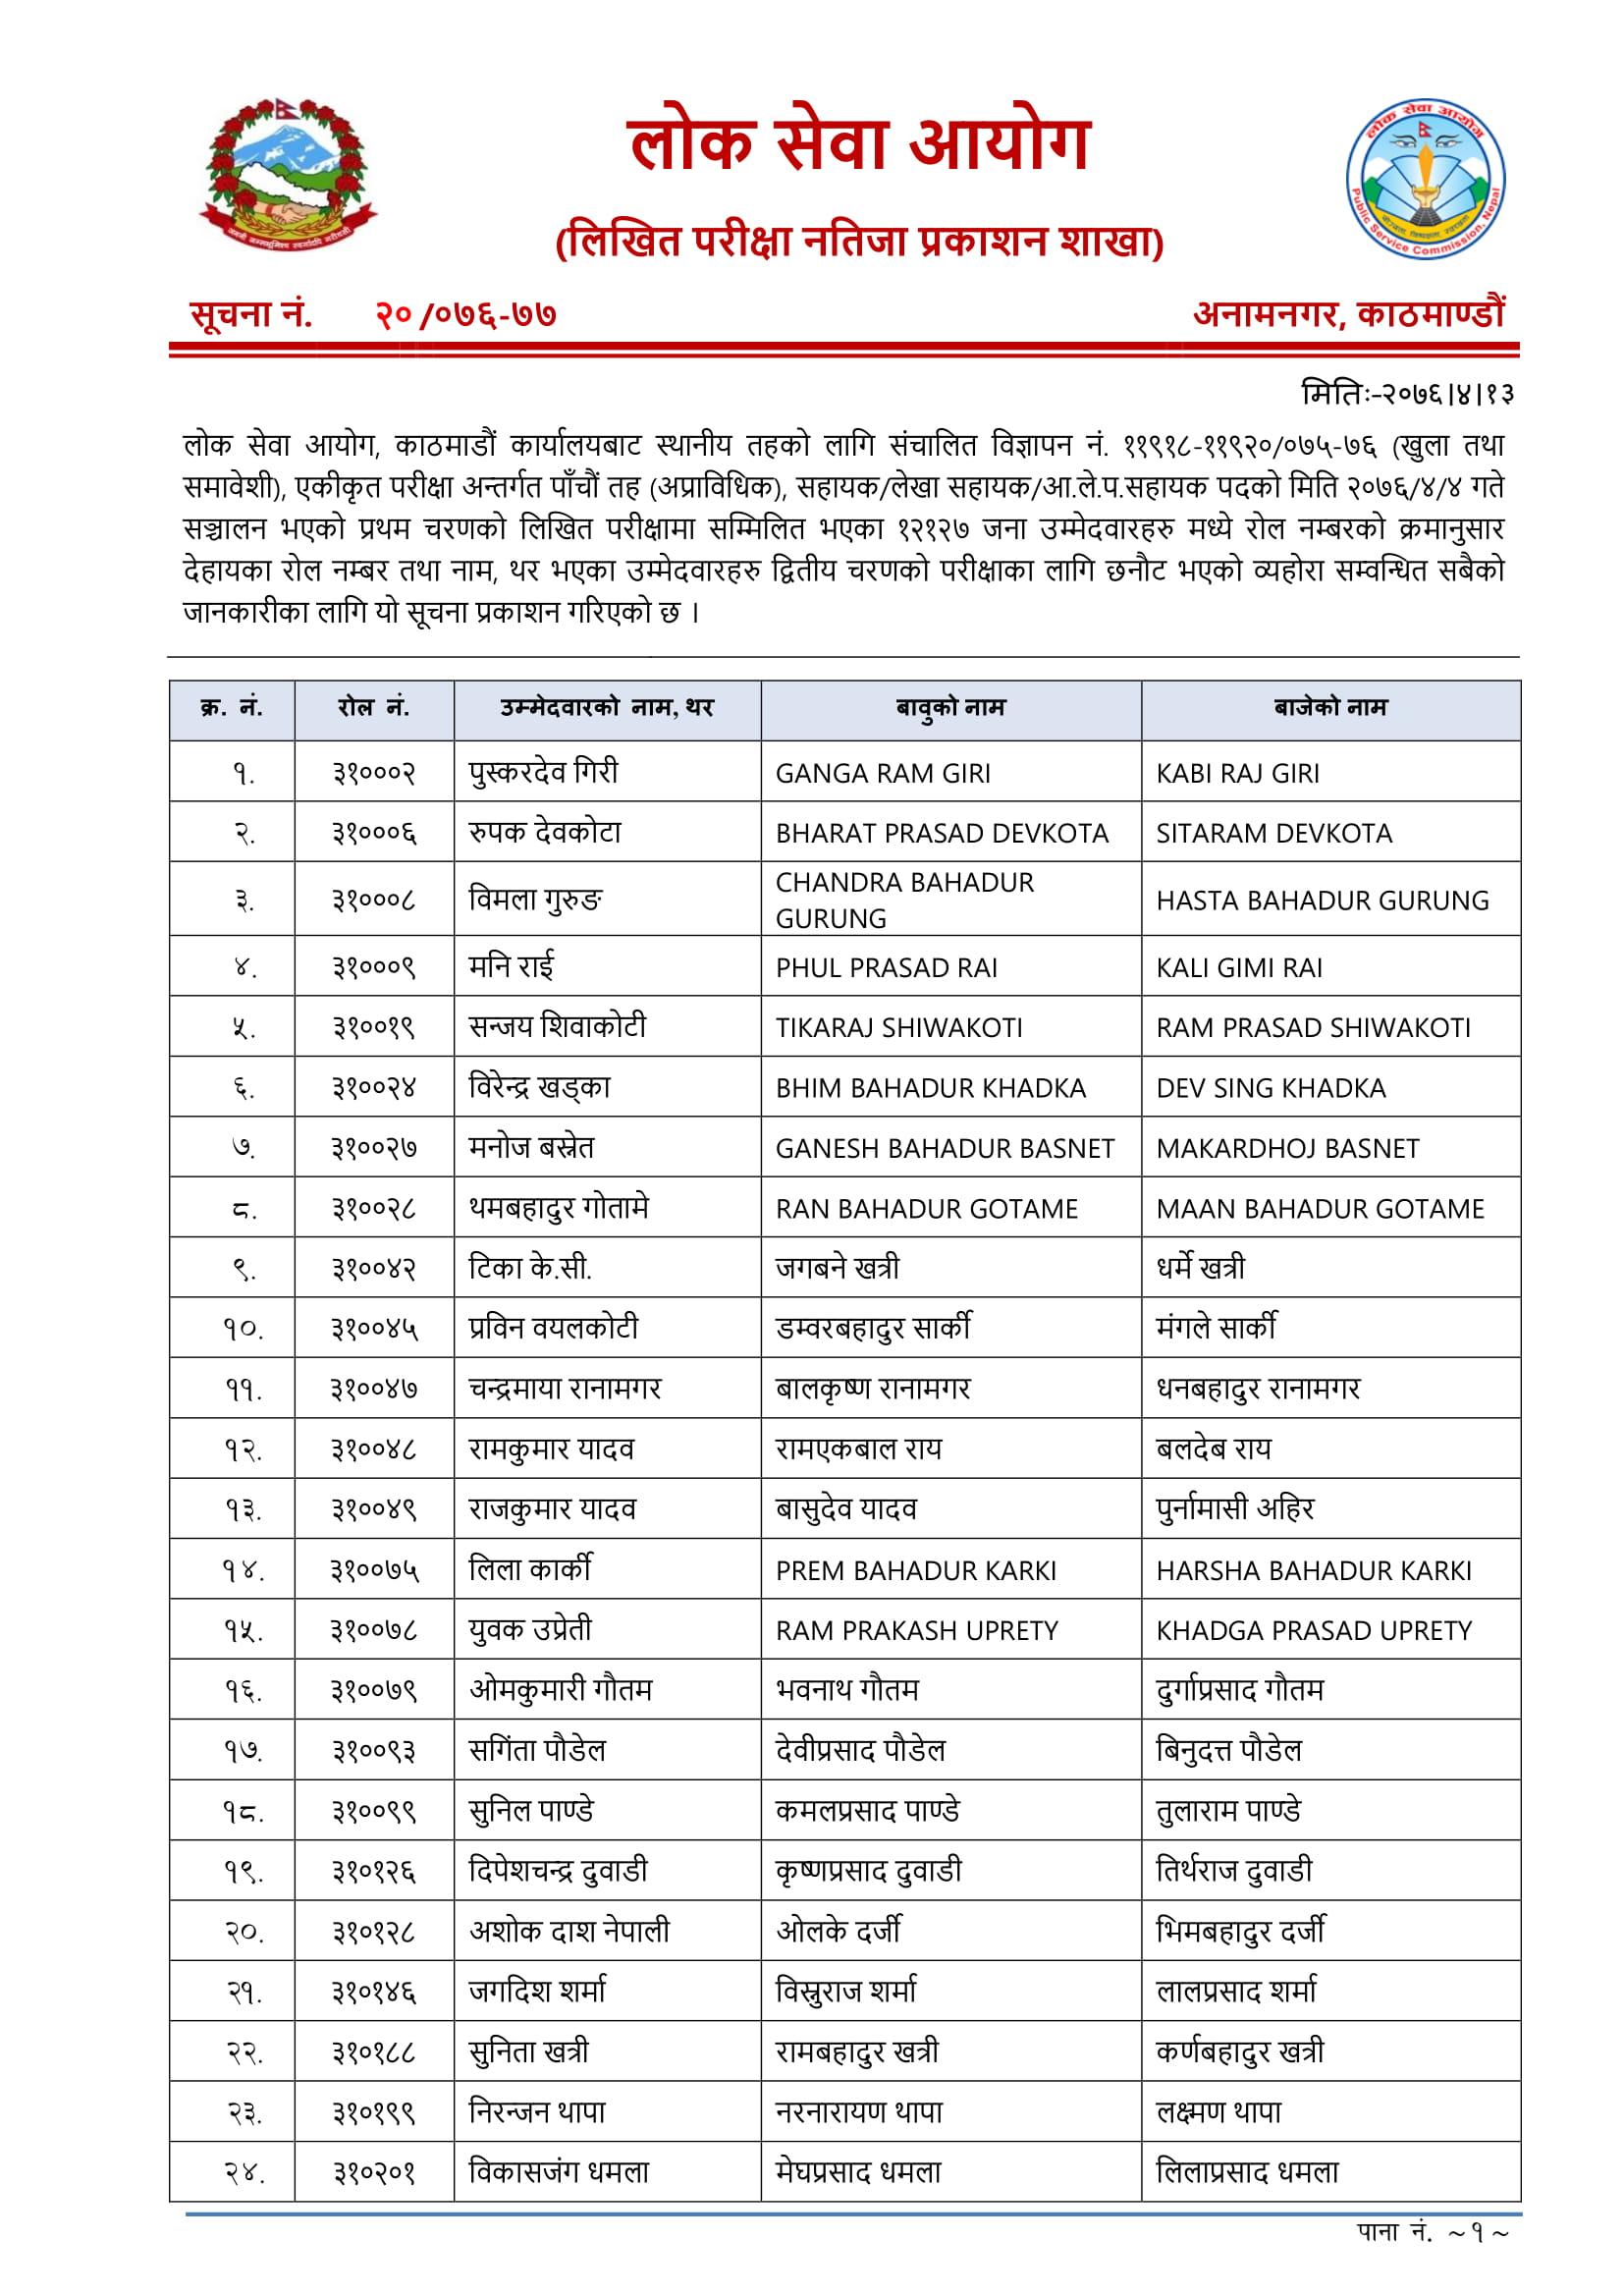 Lok Sewa Aayog Kathmandu Nasu Result 2076, Lok Sewa Aayog Kathmandu Nasu Result, Kathmandu Nasu Result 2076,Kathmandu Nasu Result,lok sewa natija,Lok Sewa Natija 2076 , Lok Sewa Result,Lok Sewa Result 2076,Lok Sewa Aayog Natija,Lok Sewa Aayog Natija 2076,lok sewa aayog result,Lok Sewa Aayog Result 2076,Lok sewa Aayog Sthaniya Taha result ,Lok sewa Sthaniya Taha result, Lok Sewa Nayab Subba Result,lok sewa Nayab Subba result, Lok Sewa Result Nayab Subba,Lok Sewa Result Nayab Subba 2076 , psc Nayab Subba result , PSC Nayab Subba Result 2076, Sthaniya Taha Nayab Subba natija ,Sthaniya Taha Nayab Subba result,Lok sewa aayog Nayab Subba Result,lok sewa aayog Nayab Subba result 2076,Lok Sewa Nasu Result,lok sewa Nasu result, Lok Sewa Result Nasu,Lok Sewa Result Nasu 2076 , psc Nasu result , PSC Nasu Result 2076, Sthaniya Taha Nasu natija ,Sthaniya Taha Nasu result,Lok sewa aayog Nasu Result,lok sewa aayog Nasu result 2076,नायब सुब्बा पाँचौं तह लिखित नतिजा,नायब सुब्बा नतिजा,,पाँचौं तह नायब सुब्बा नतिजा,पाँचौं तह नतिजा,स्थानीय तह नायब सुब्बा नतिजा,स्थानीय तह नतिजा,स्थानीय तहको अधिकृत छैठौ तह,